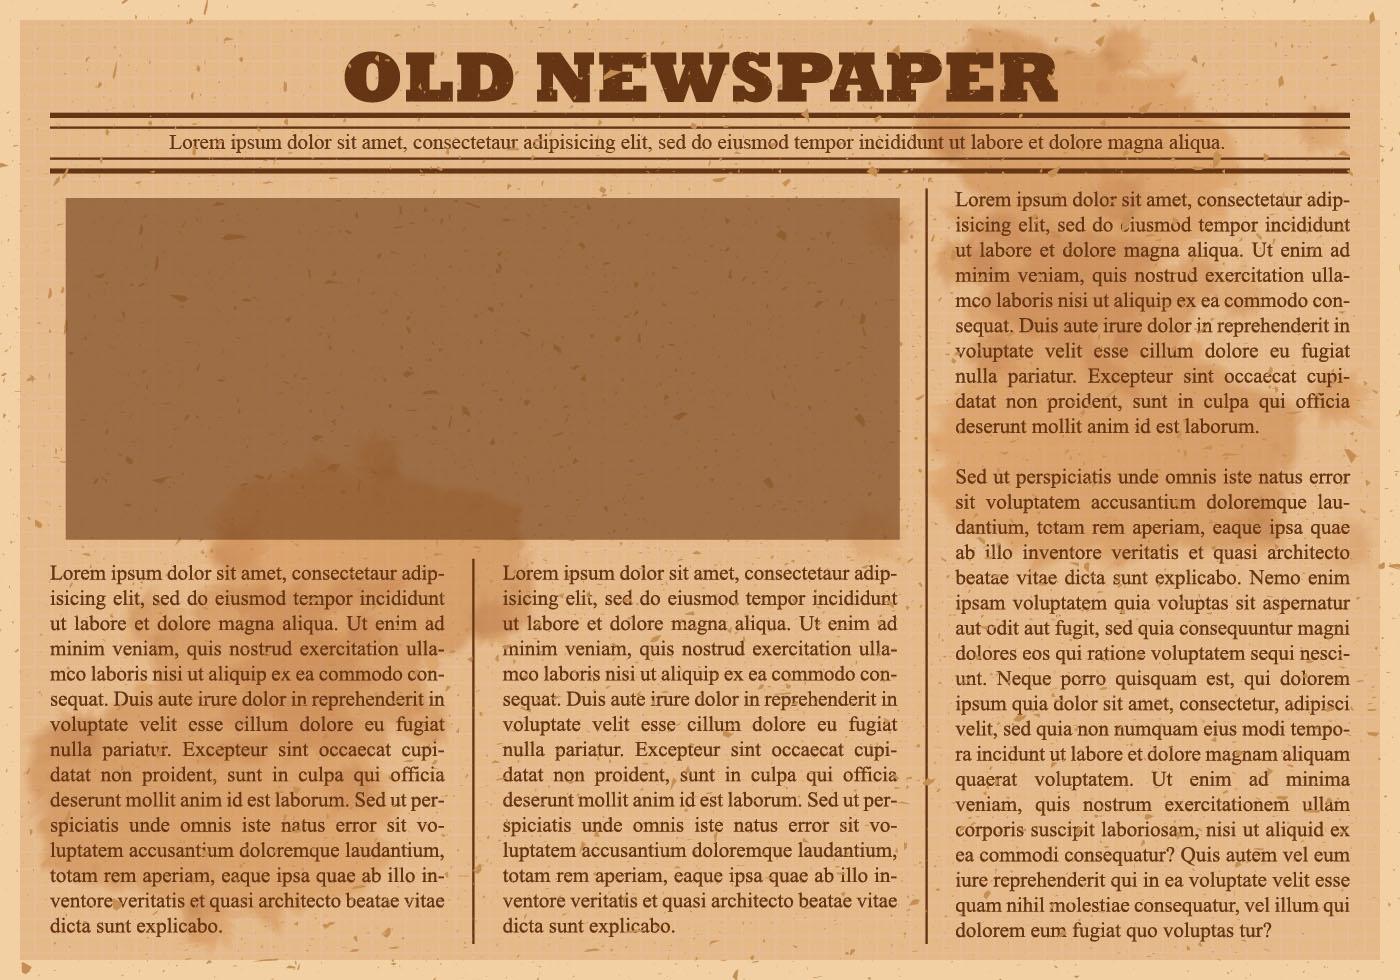 Old Newspaper Vector Download Free Vector Art Stock Graphics Images